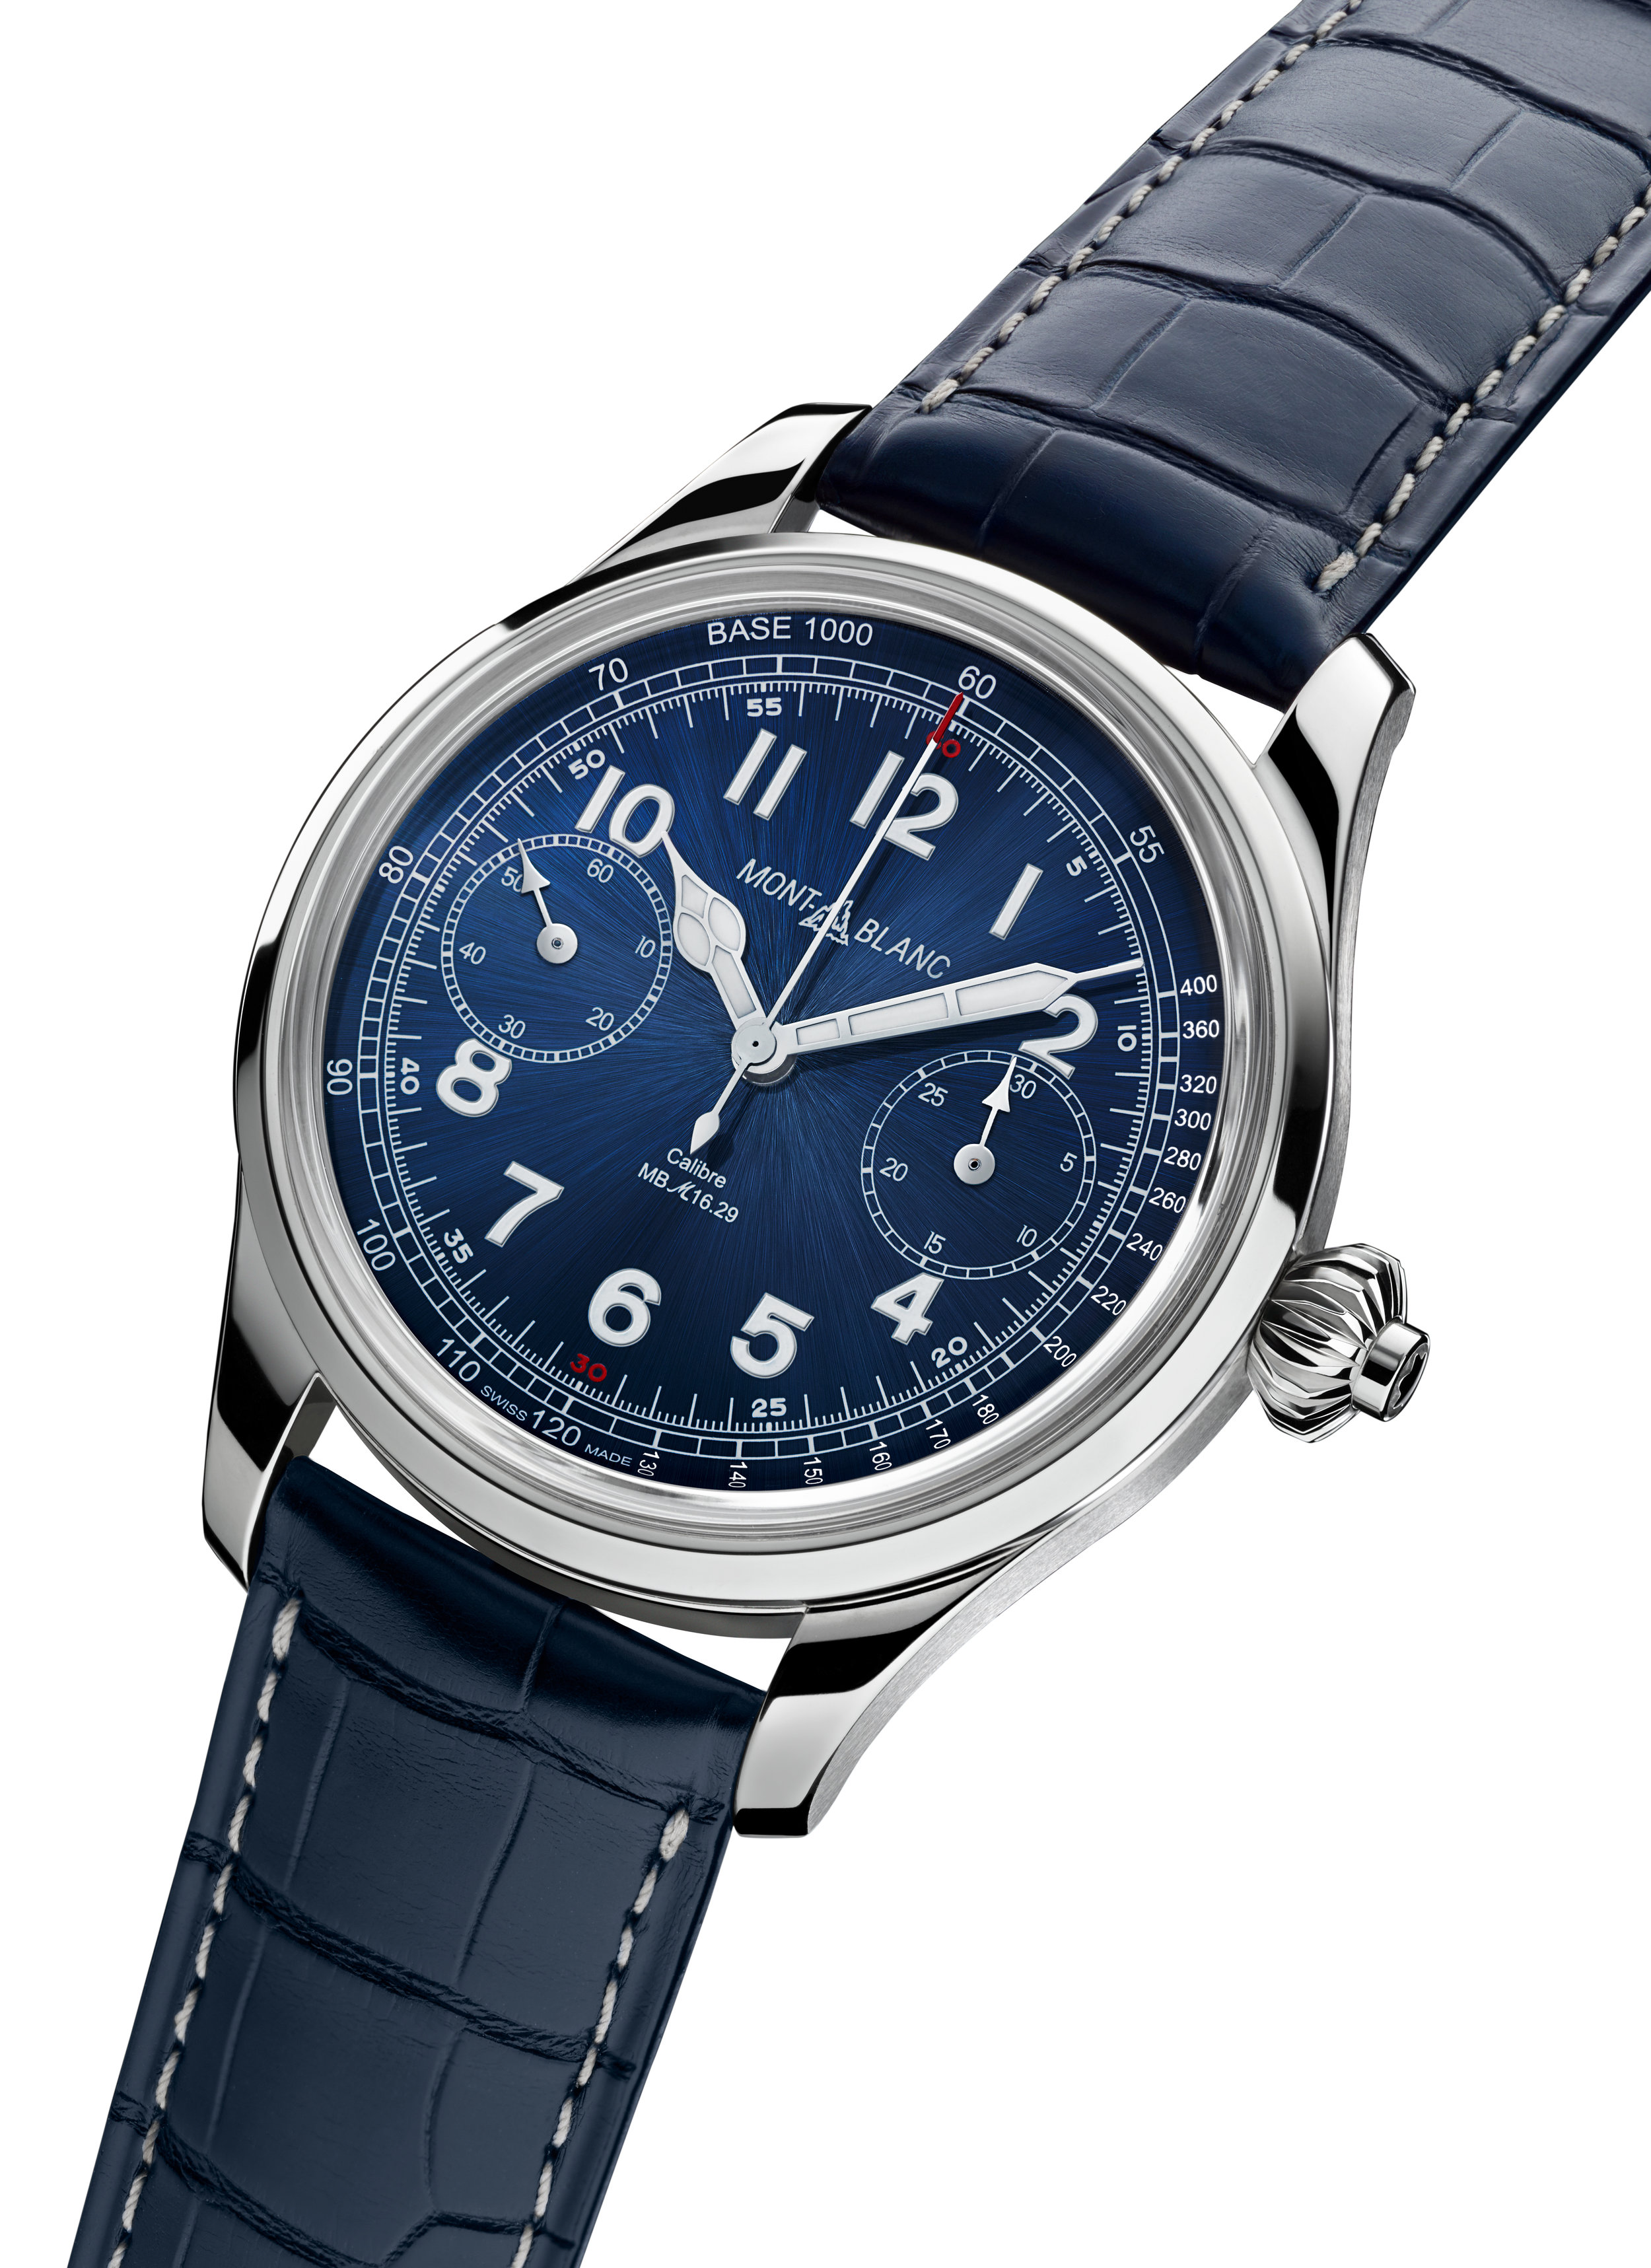 Chronograph Watch Prize: